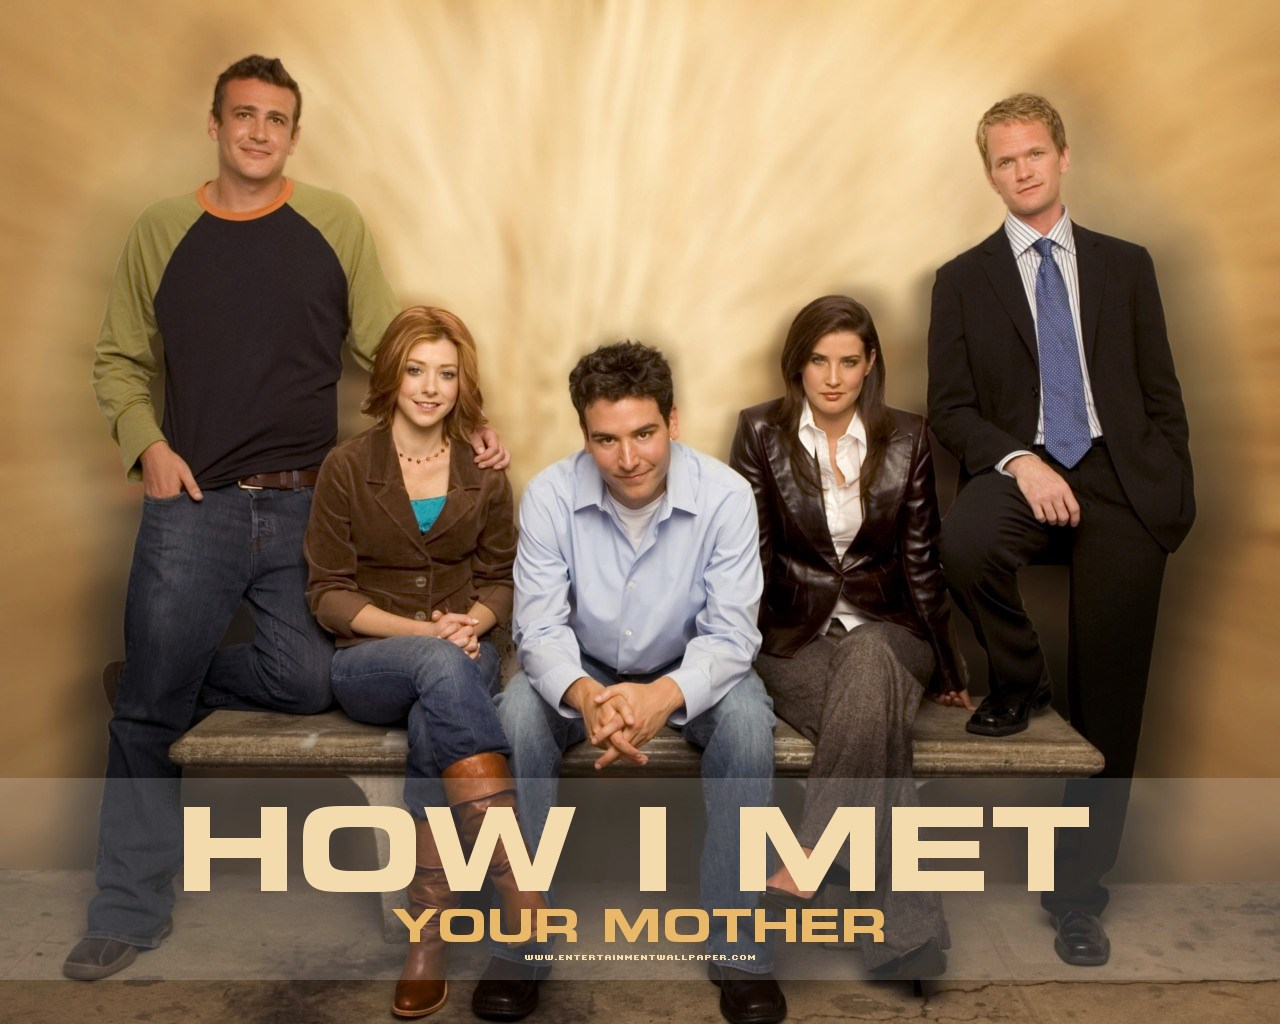 How I Met You Mother